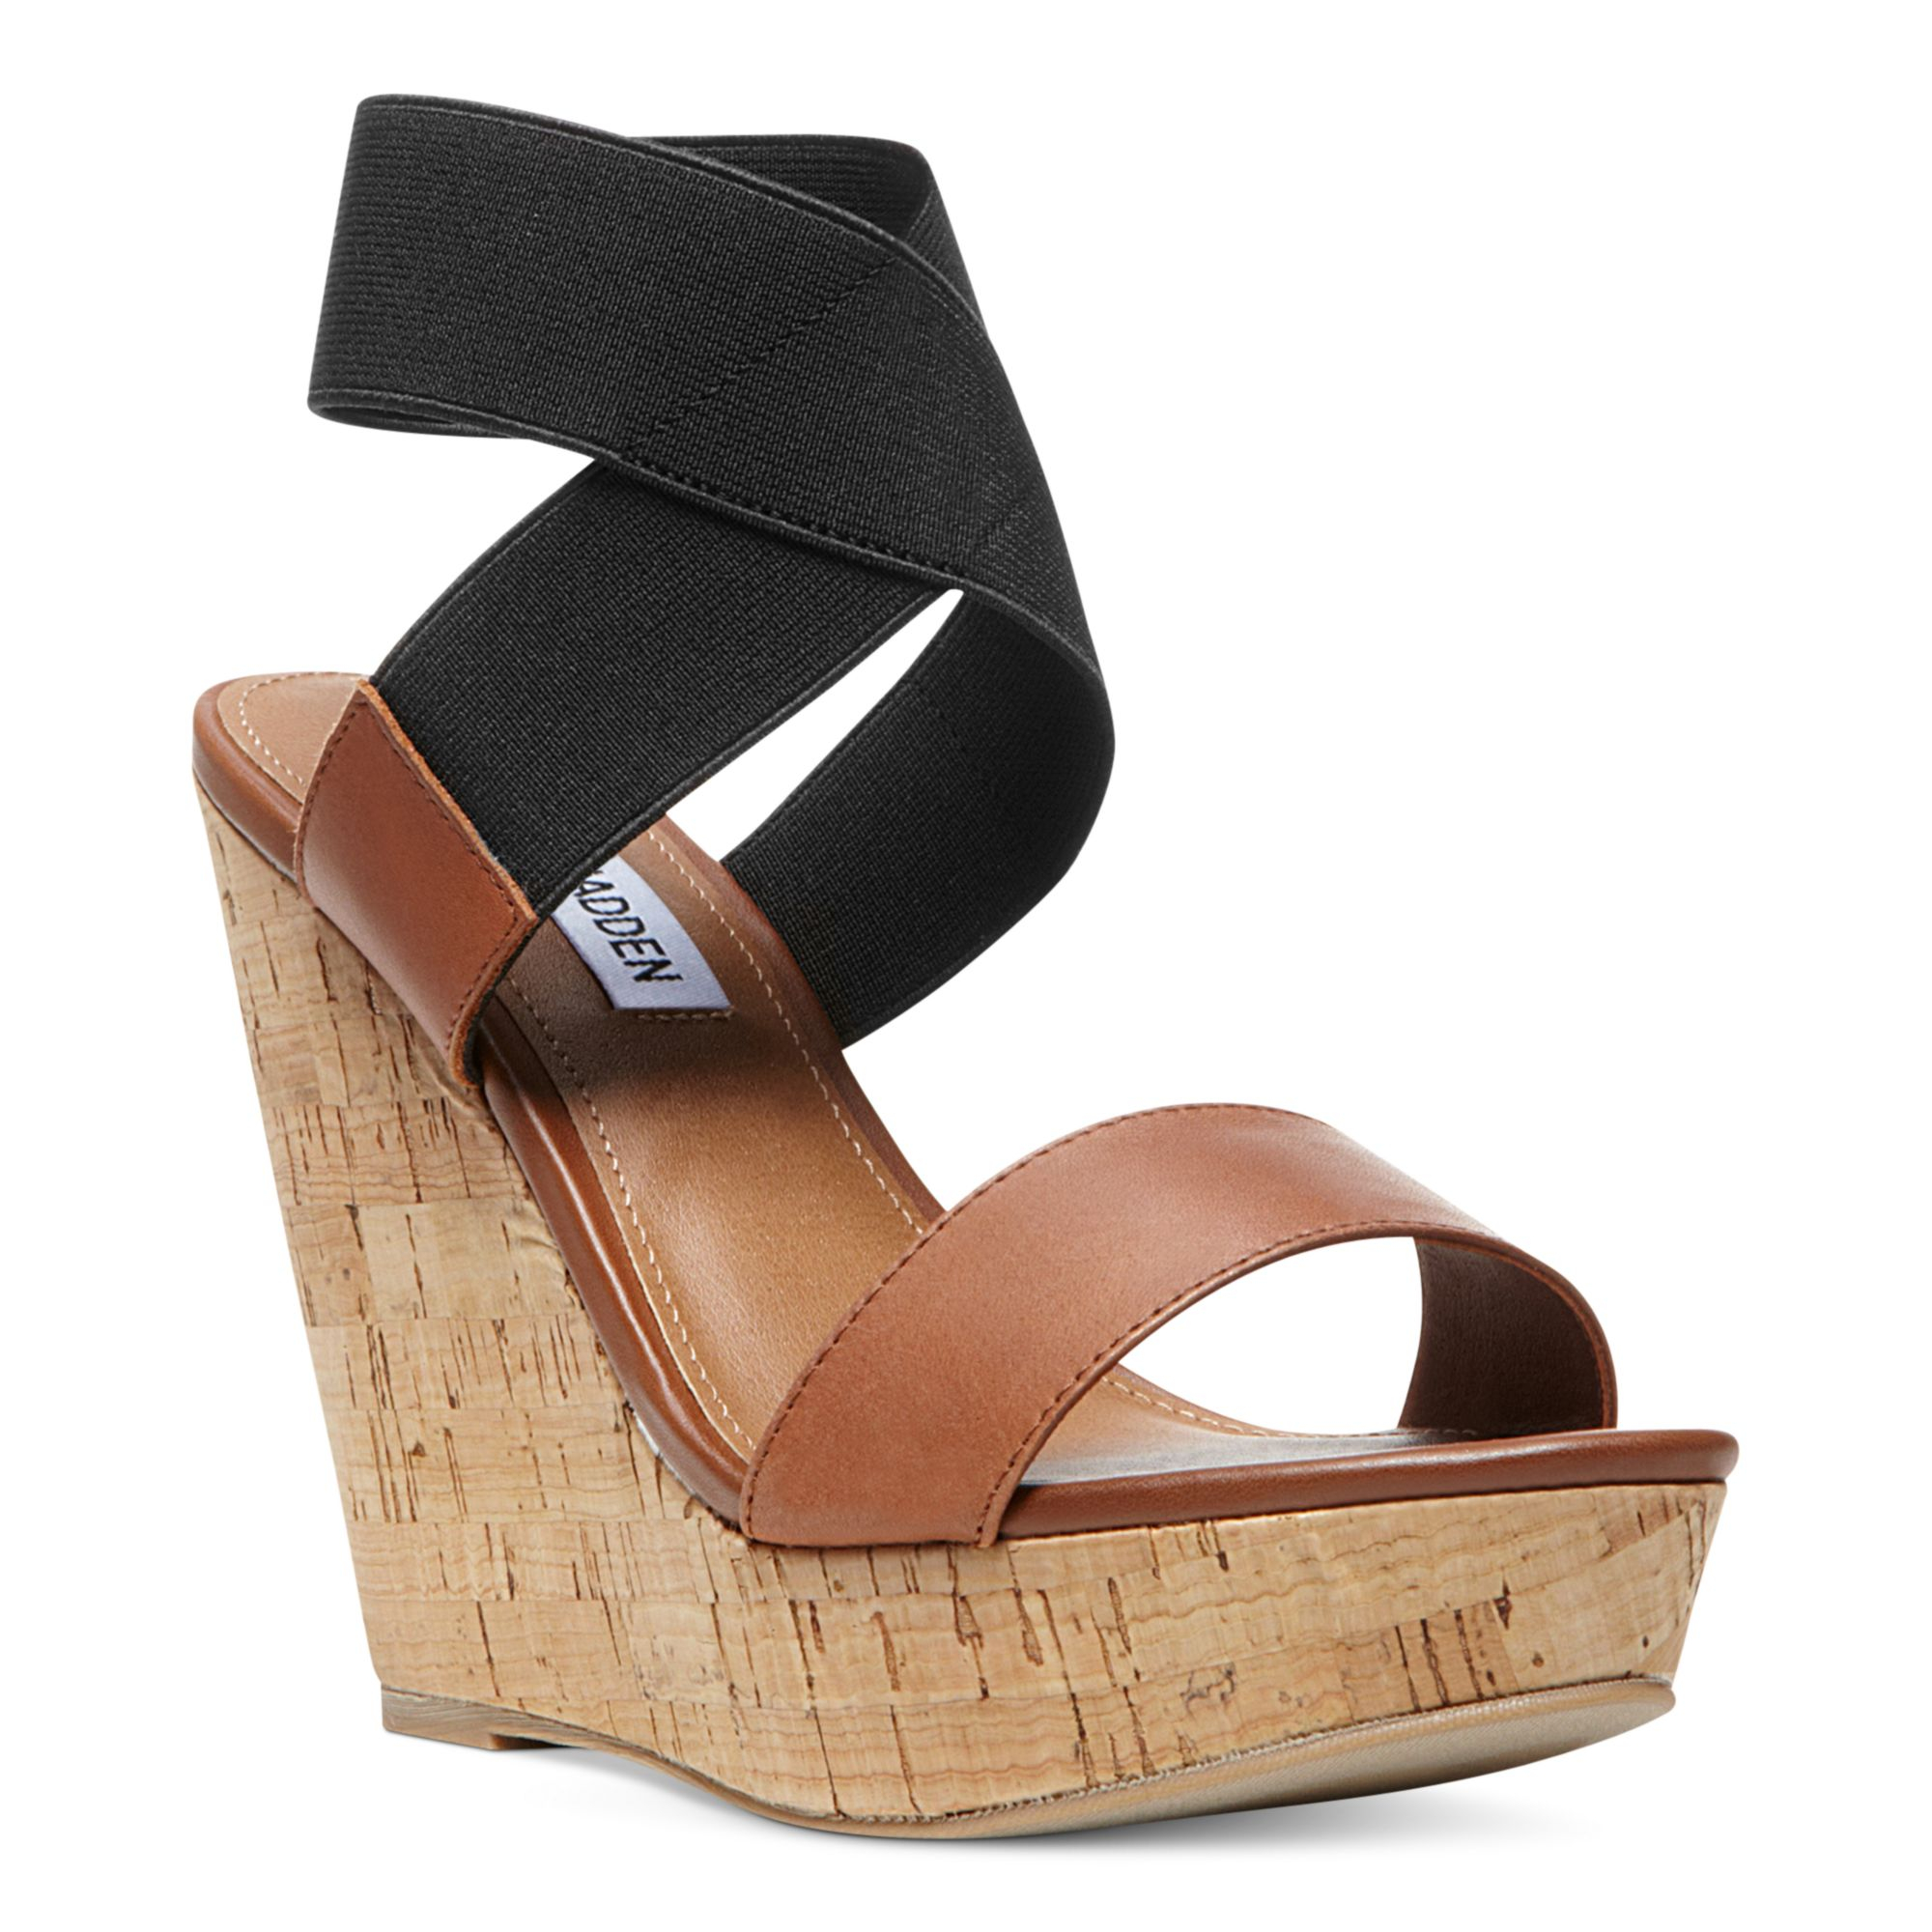 steve madden roperr platform wedge sandals in brown lyst